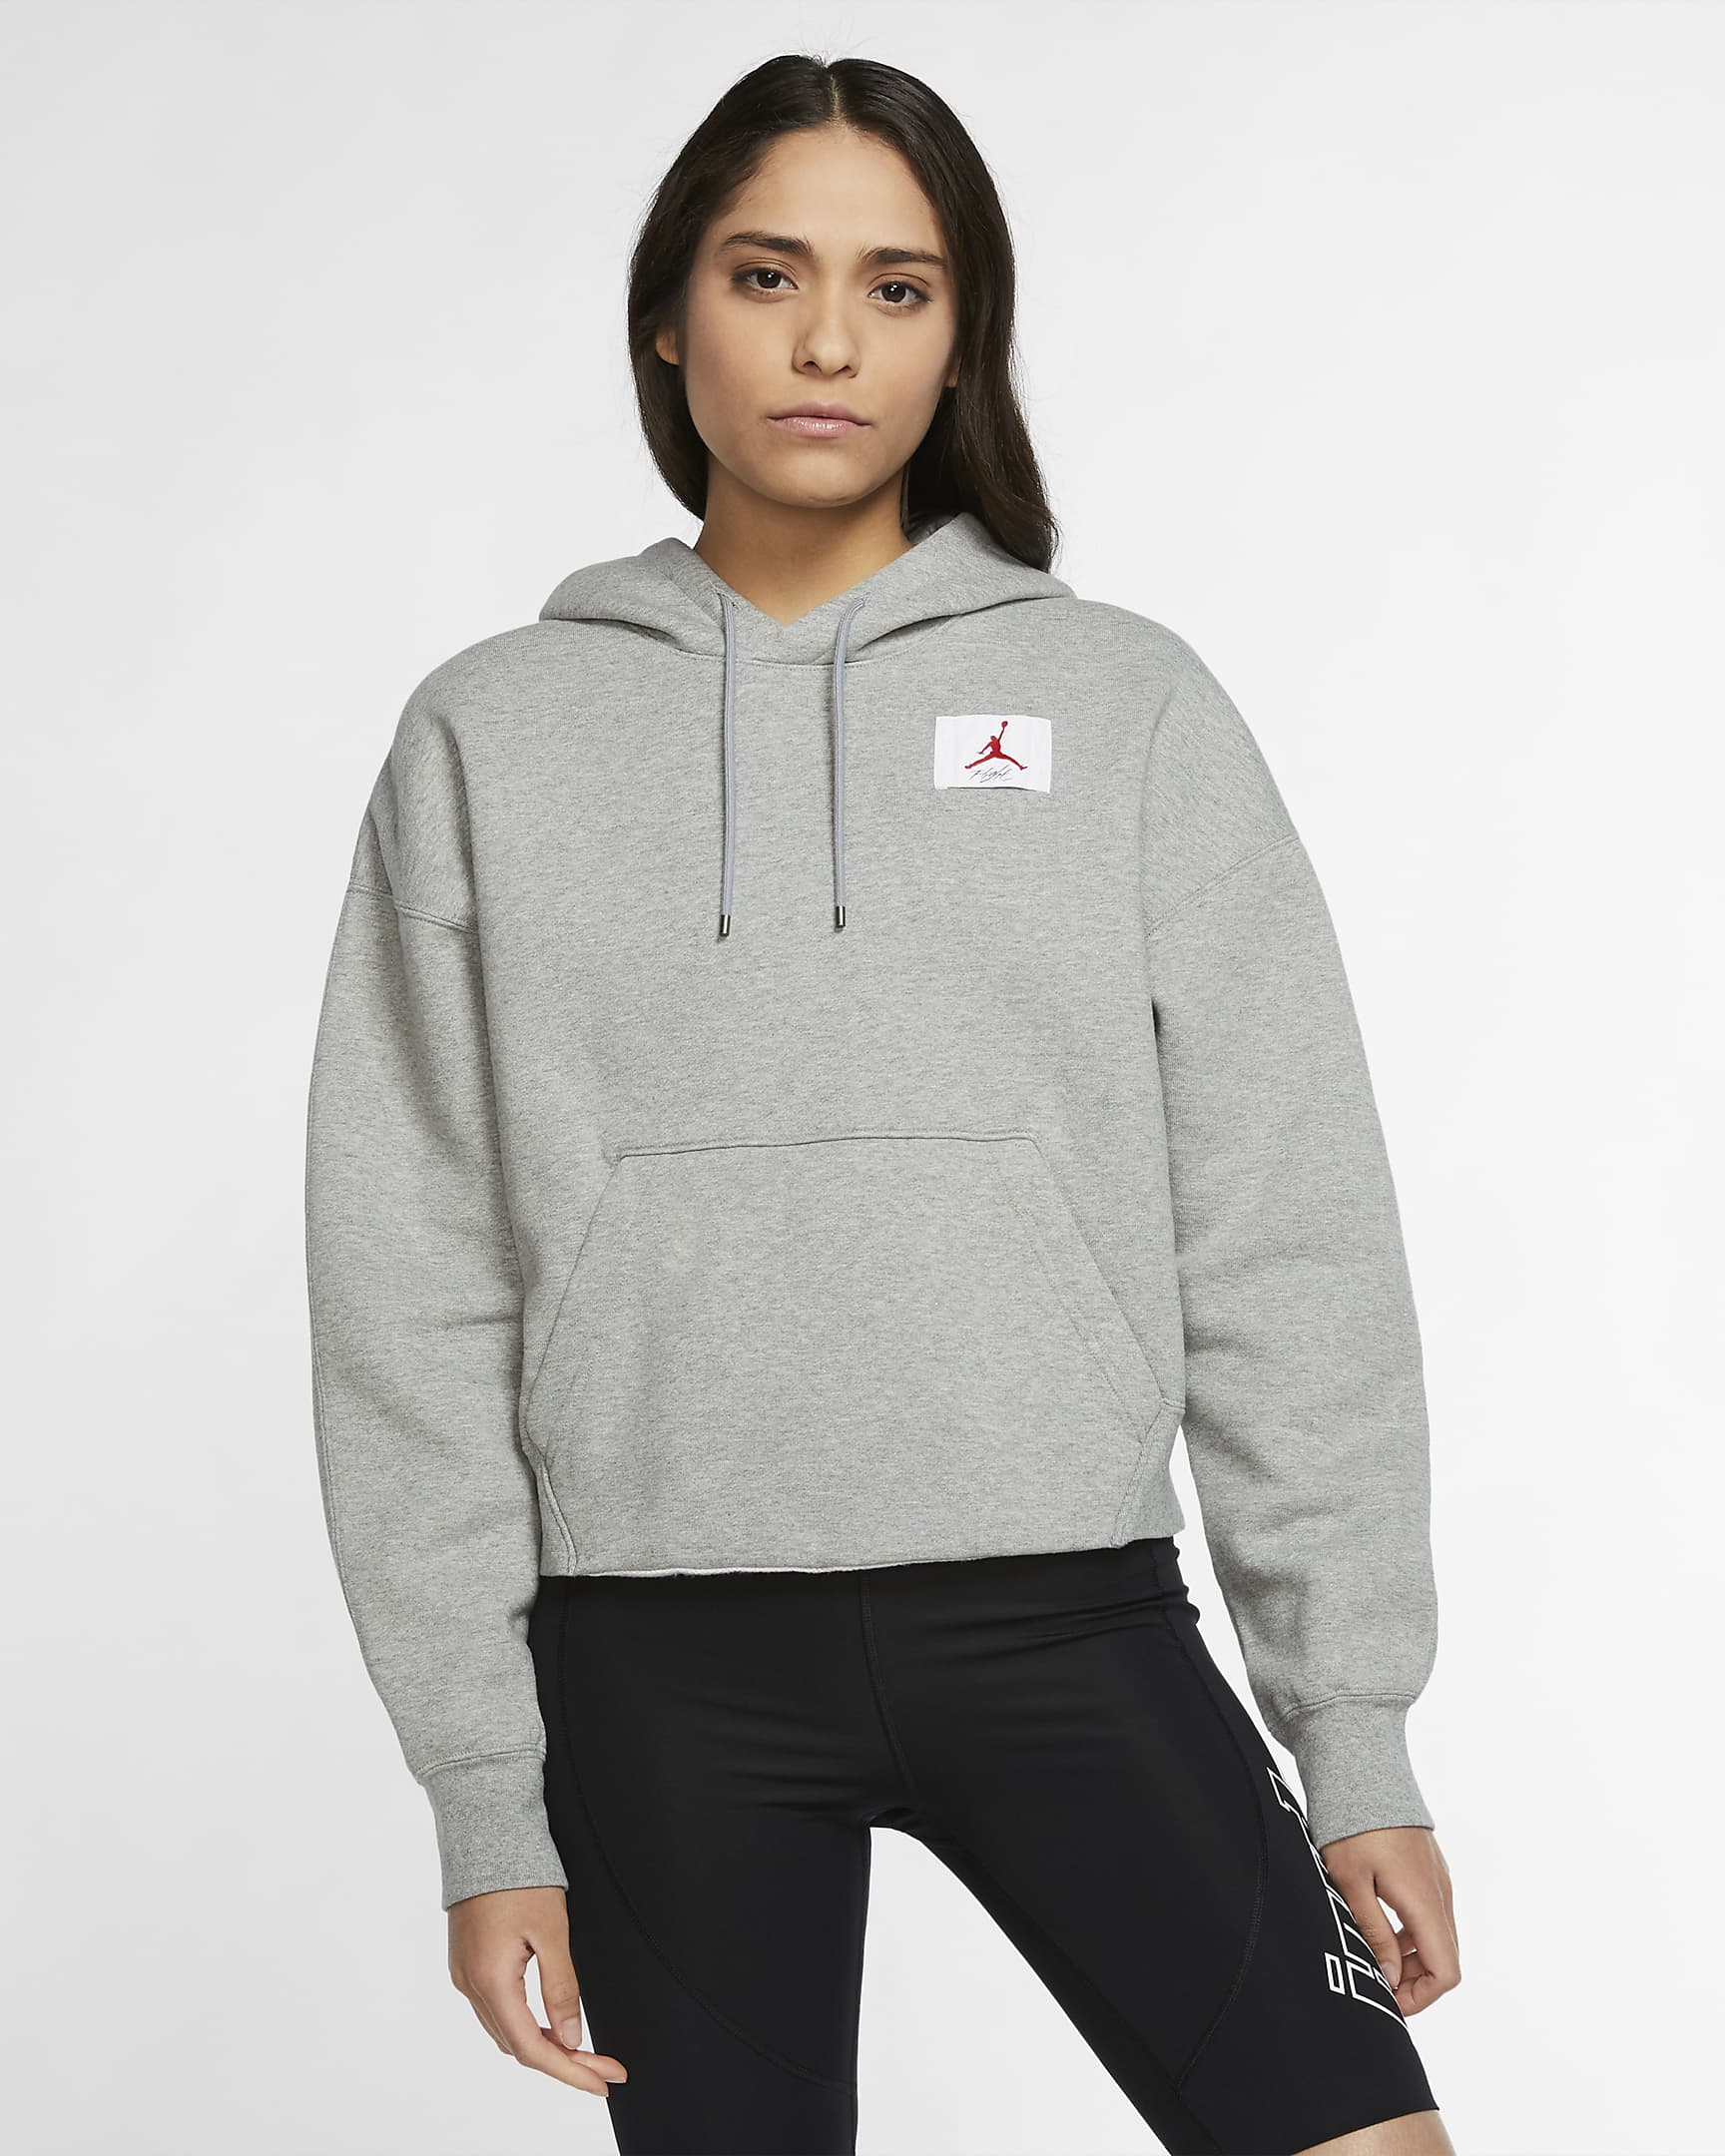 jordan-flight-womens-fleece-pullover-hoodie-M8SP84-1.png